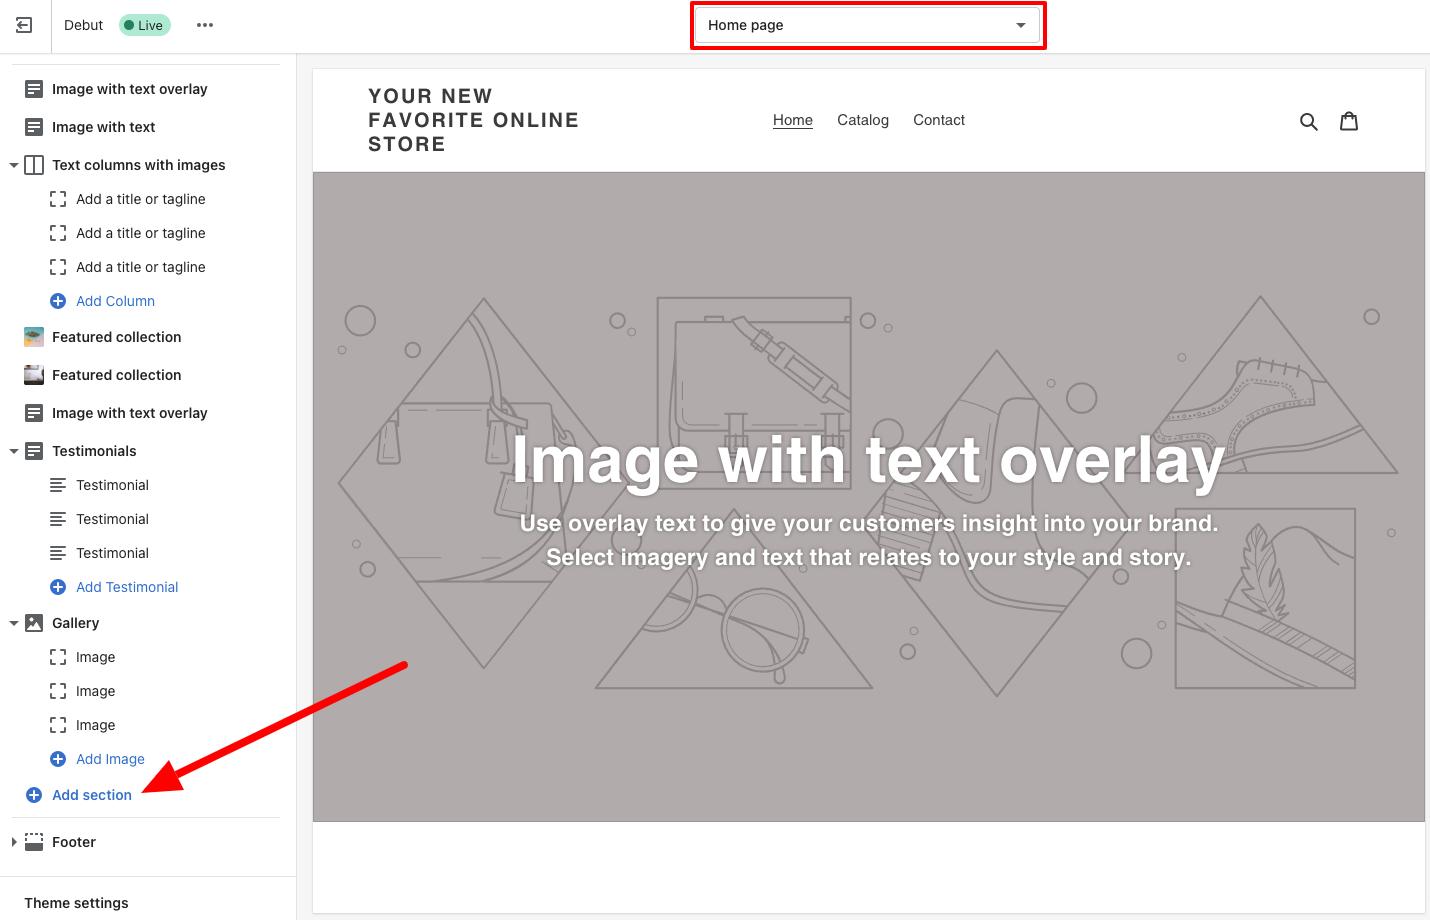 shopify debut theme editor homepage